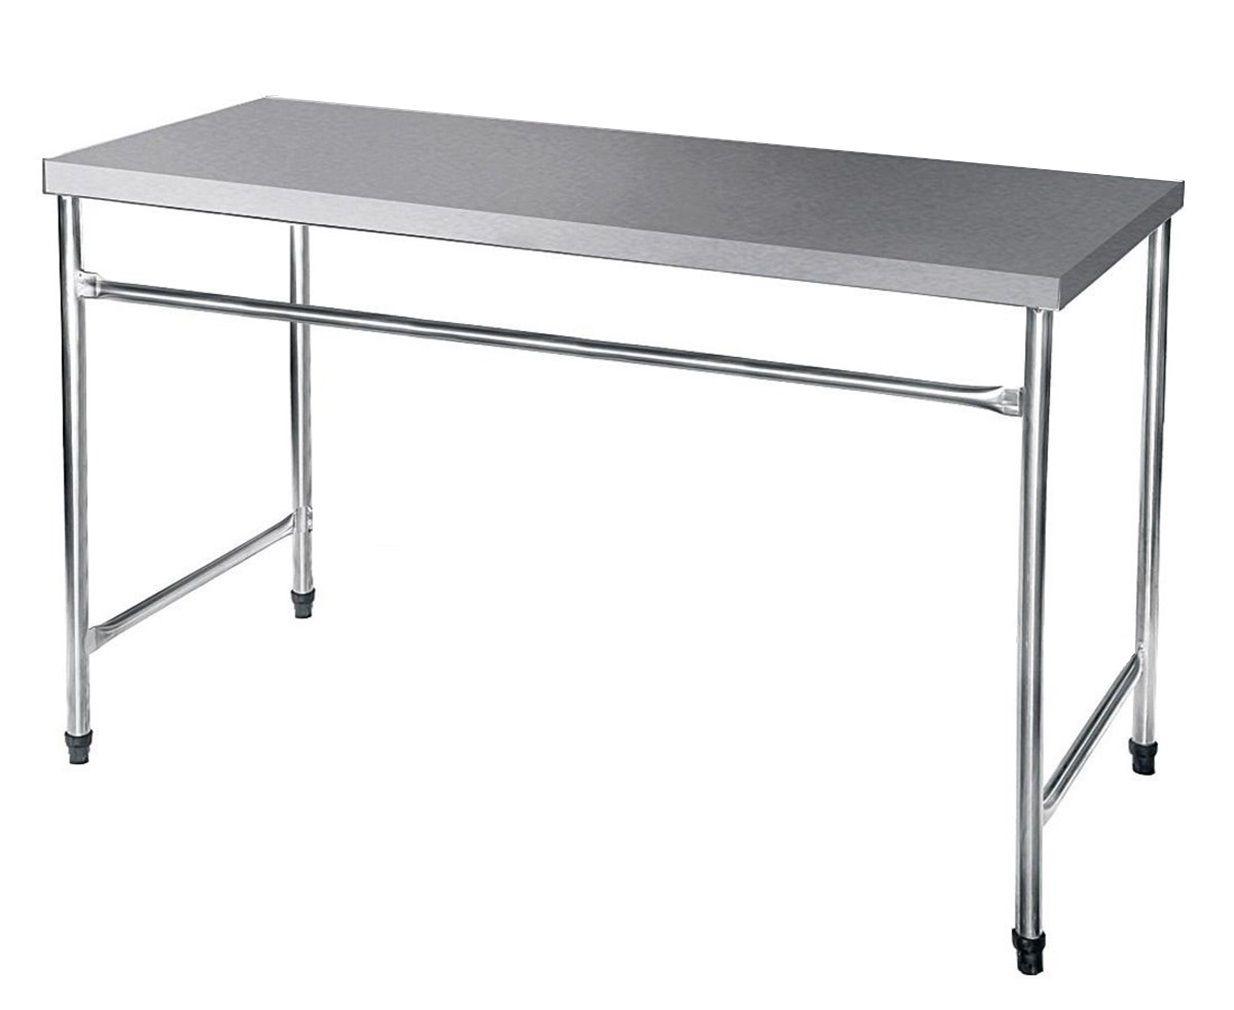 Bancada / Mesa Em Aço Inox (130x60x85)